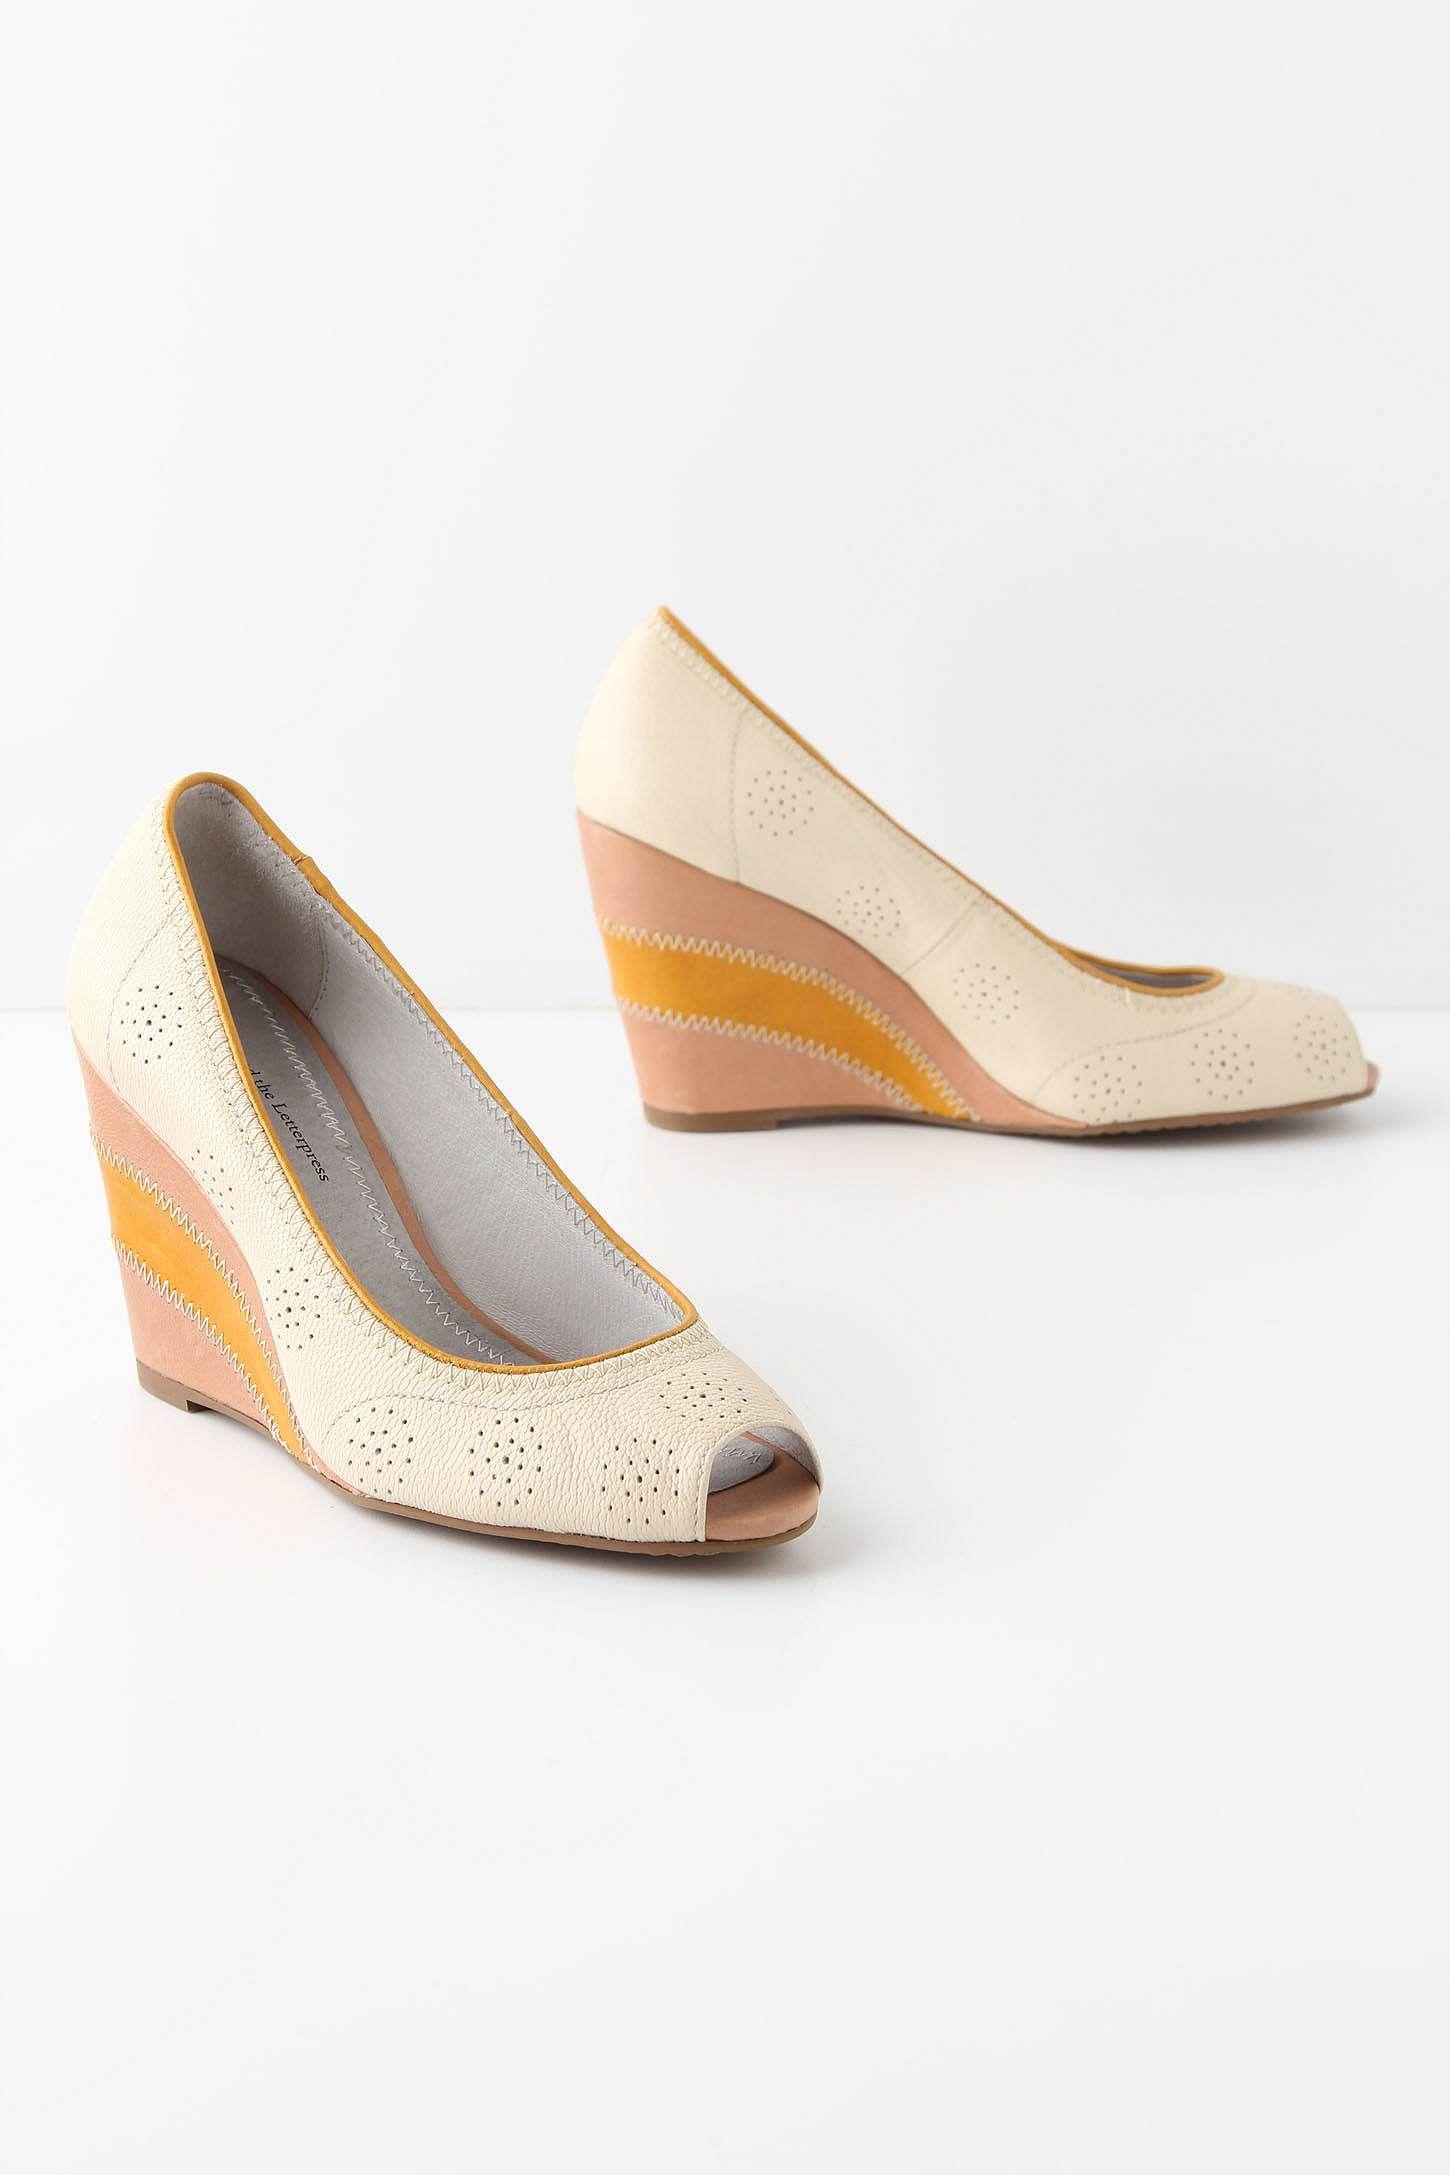 Yellow and cream peep toe wedges